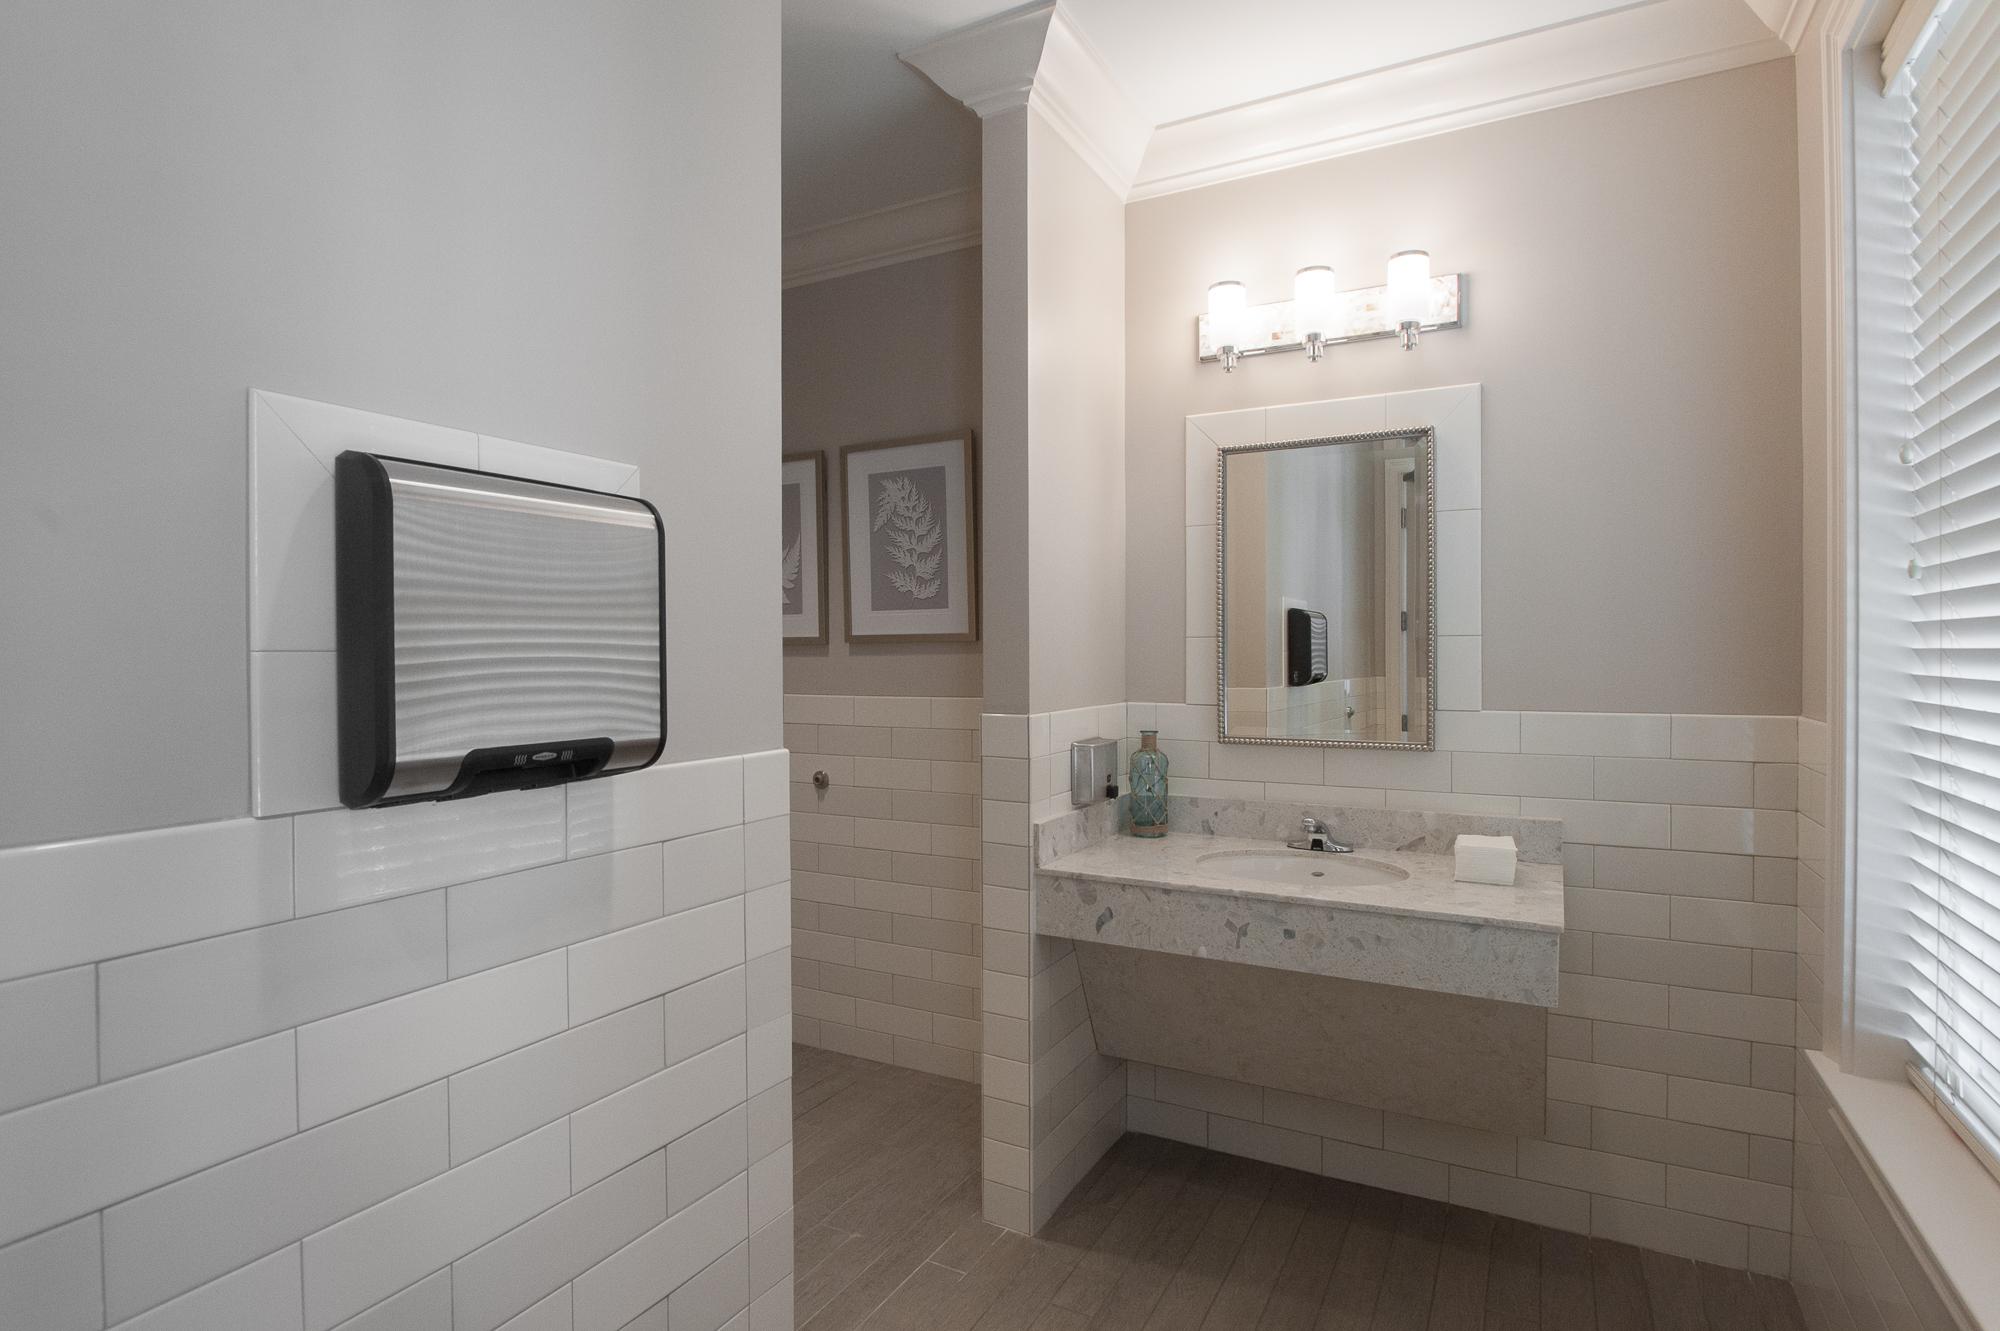 markland-hines-st augustine-florida-nefba-northeast florida-southeastern united states-commercial interior design-licensed interior designer-manor-interior design florida-restroom-pool bath-bathroom-ADA-white-dyson-restroom wainscot.jpg